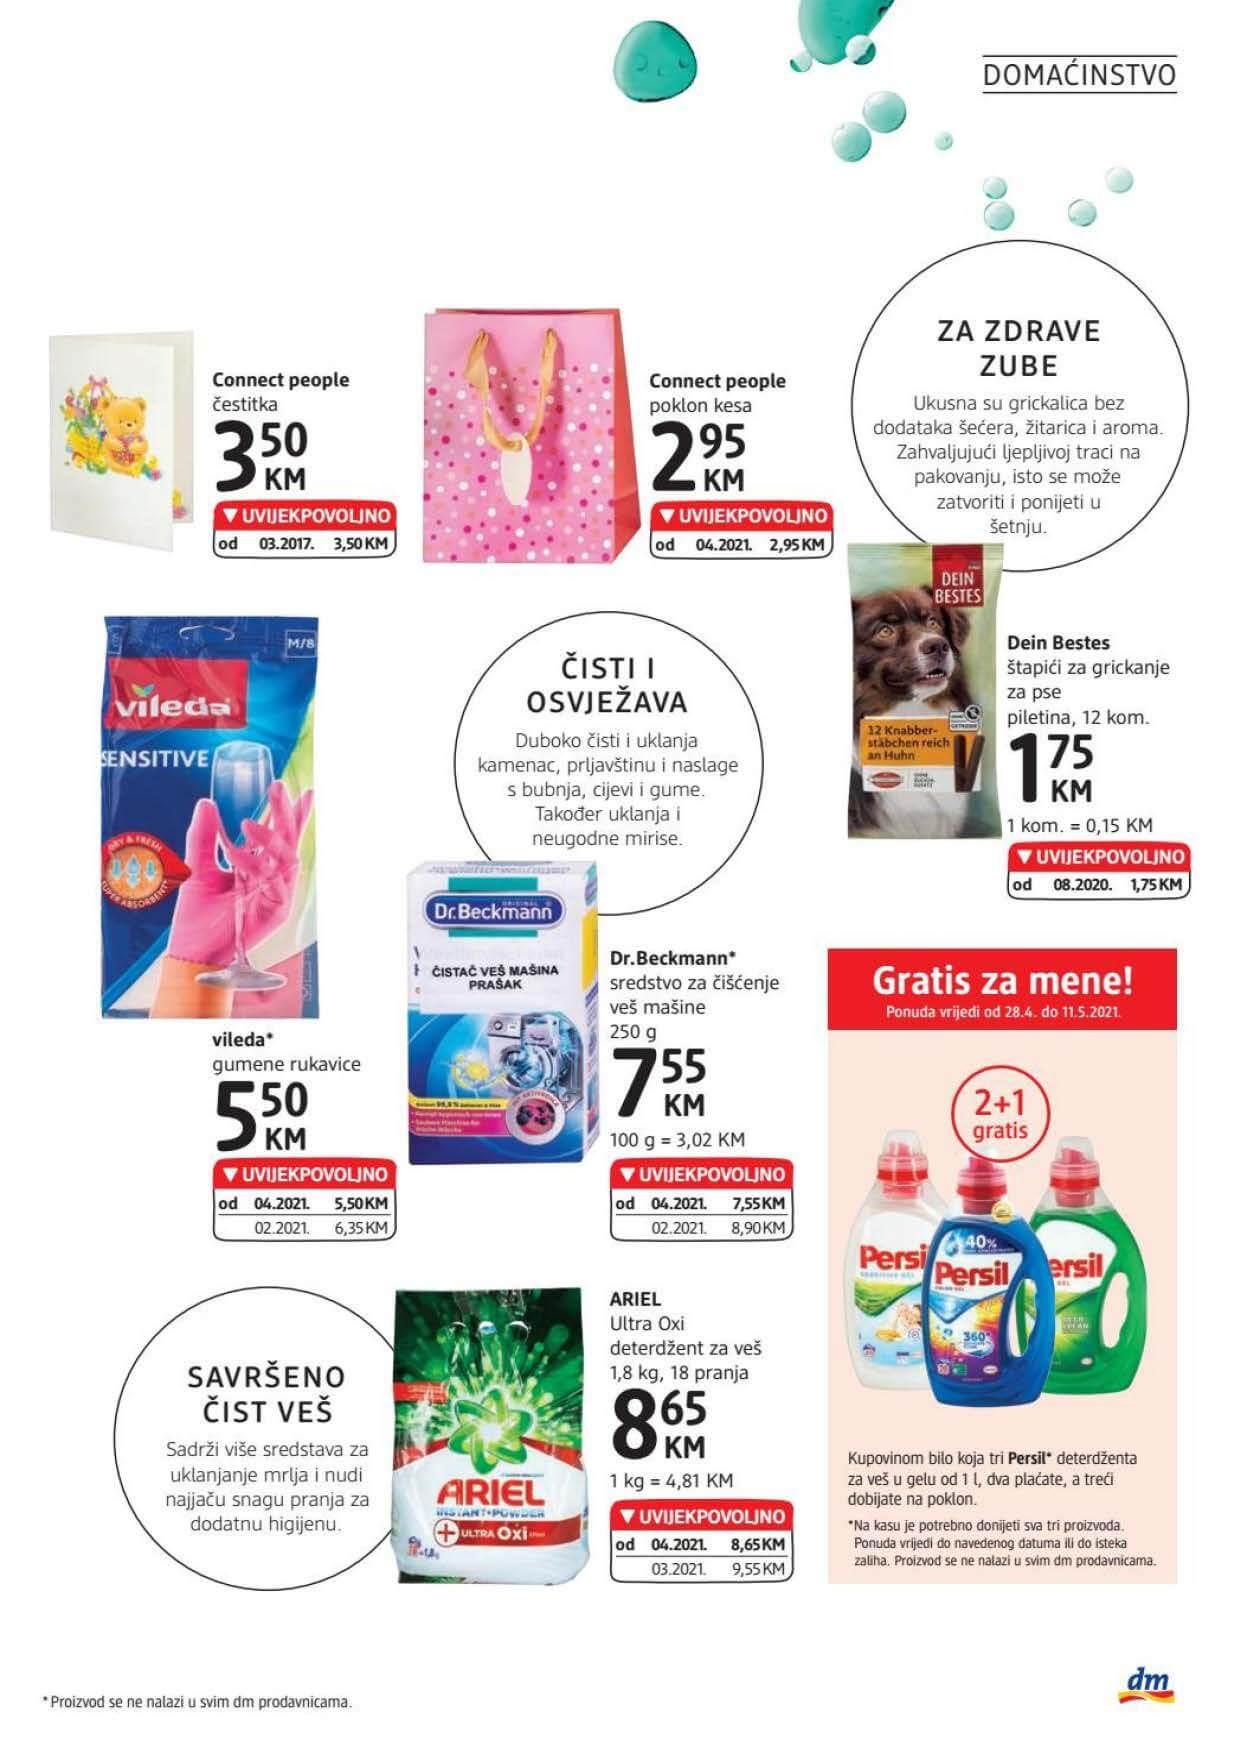 DM Katalog BiH APRIL MAJ 2021 28.04.2021. 11.05.2021. Page 21